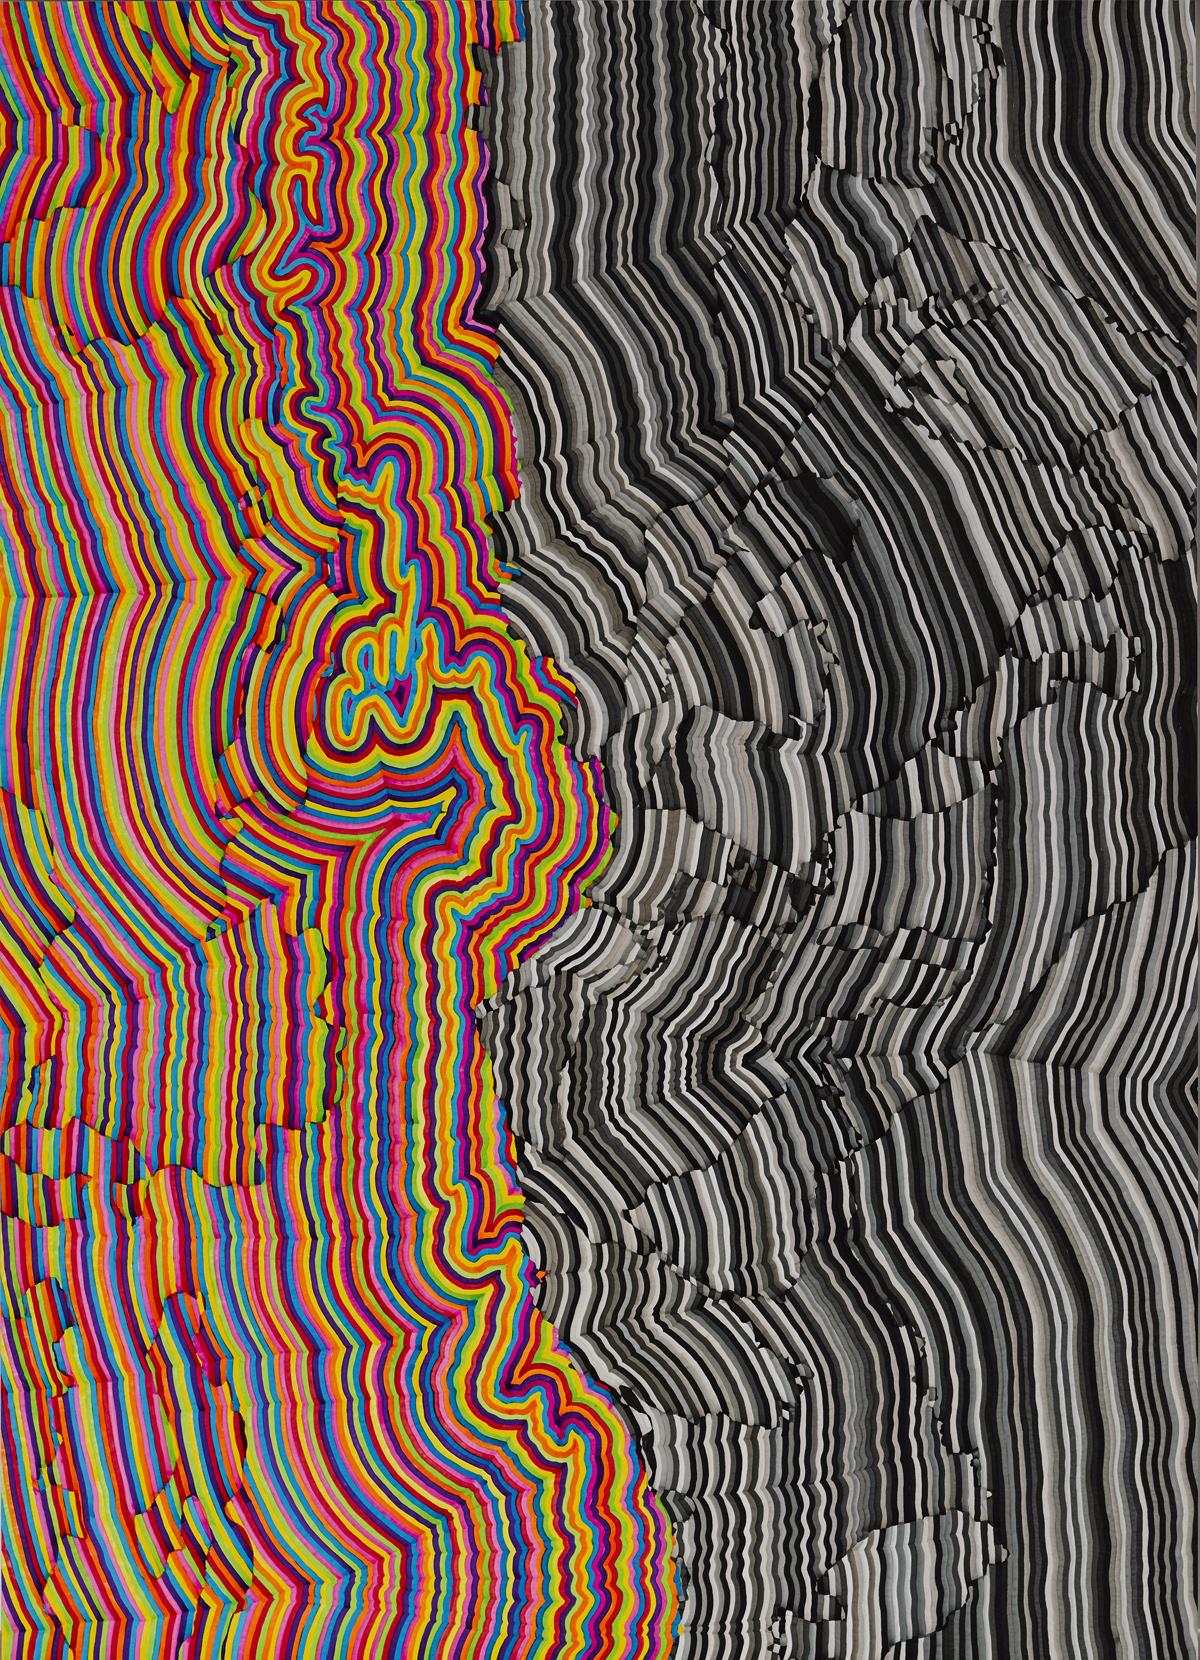 Sierra.jpg (v1) 2016 Lightfast Pigment Paint on Archival 100% Cotton Portfolio Rag. Cold mounted to Dibond. 181cm x 131.5cm